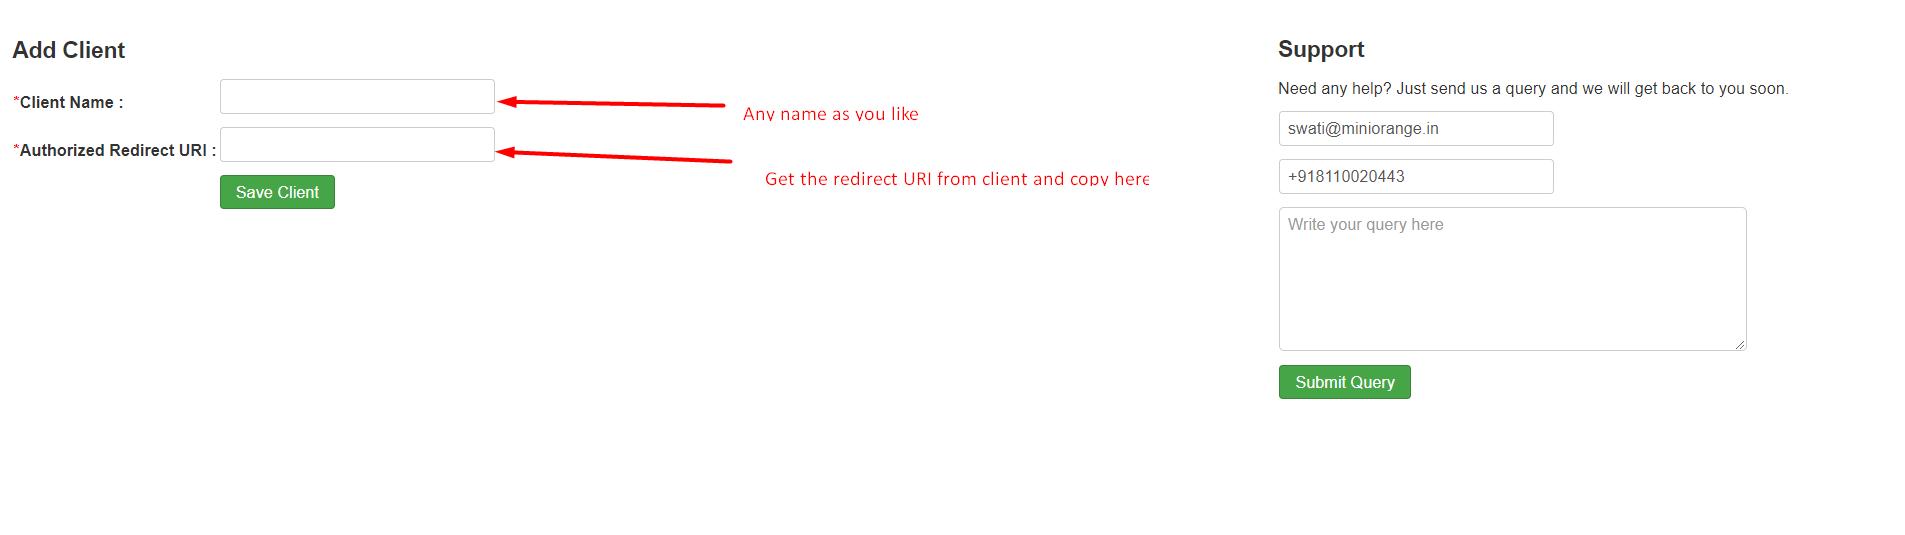 Joomla oauth server authorized redirect URI